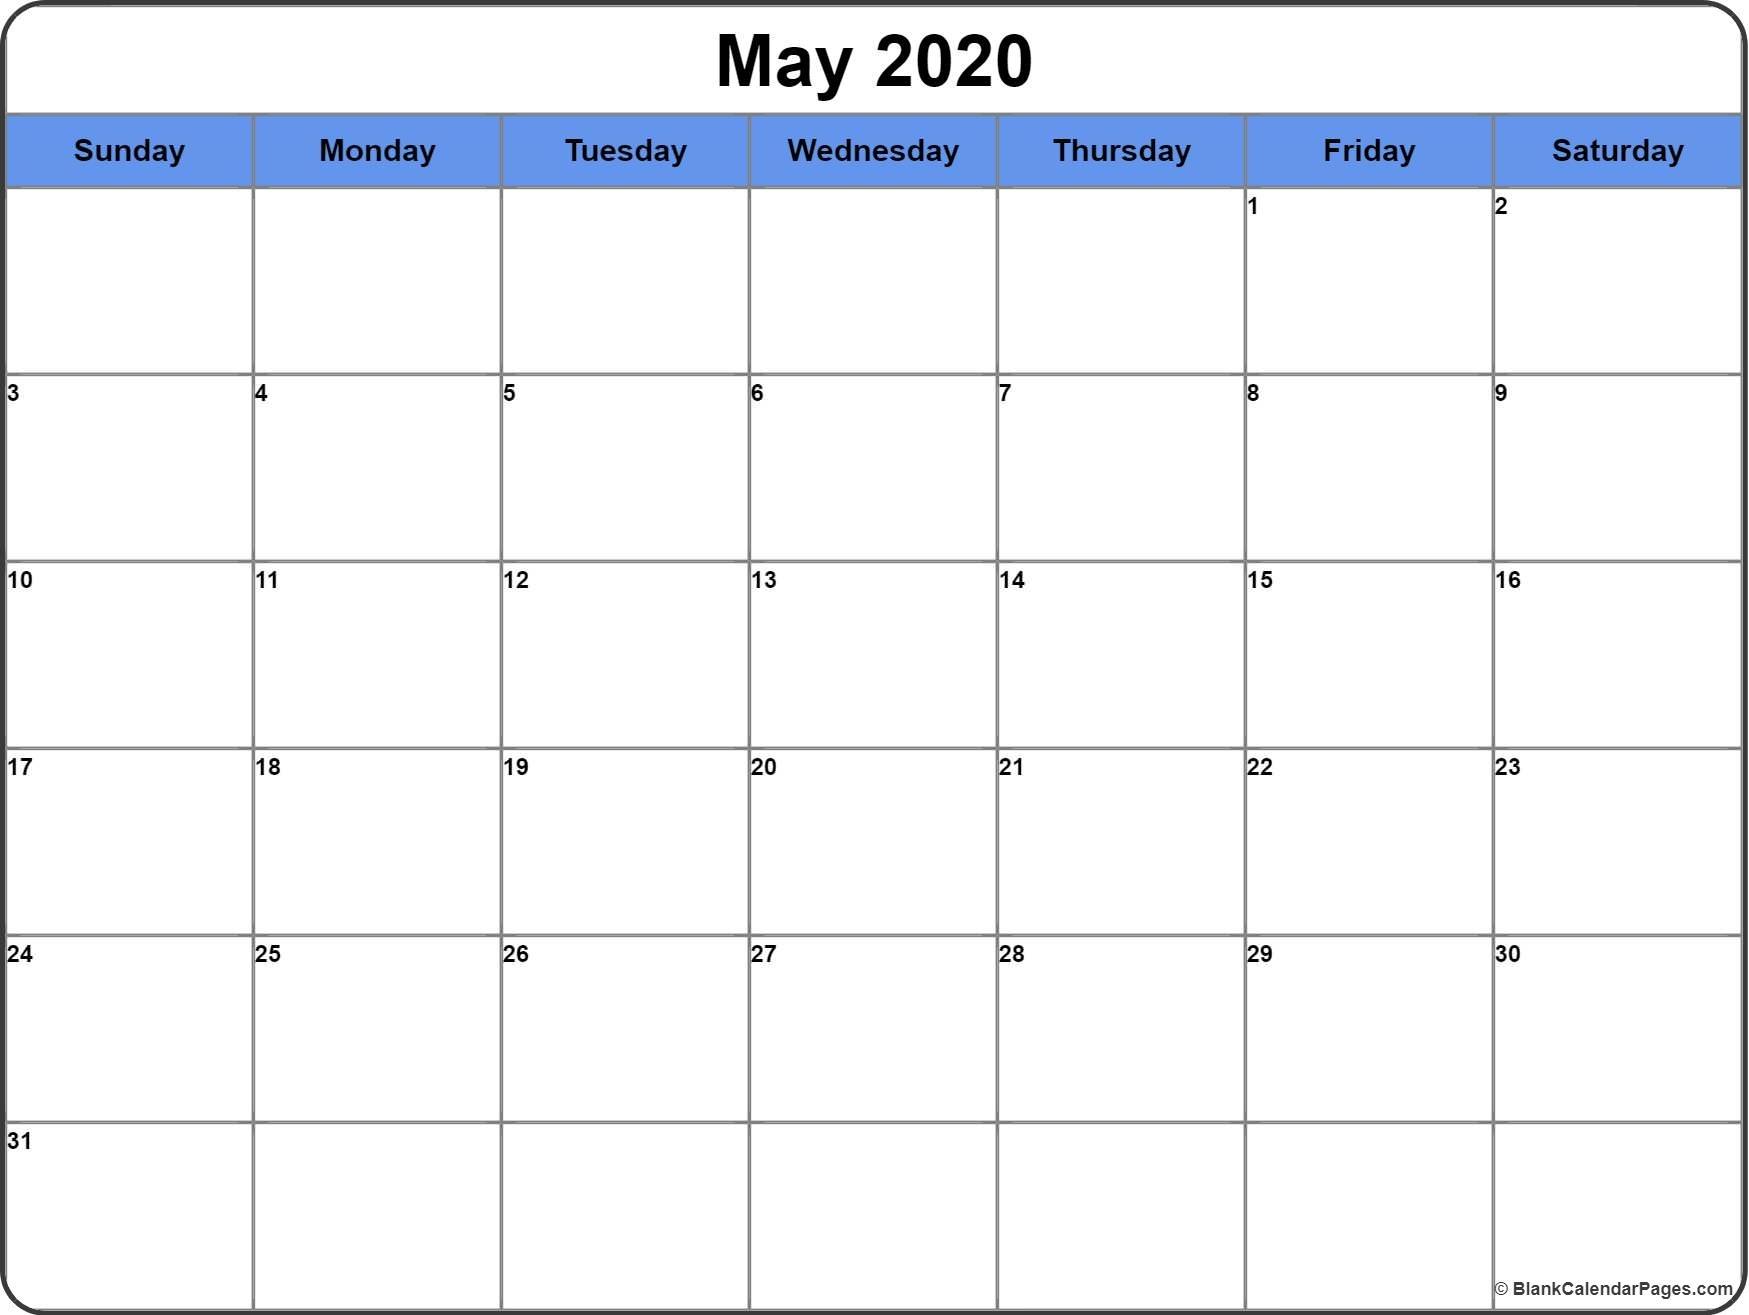 May 2020 Calendar | Free Printable Monthly Calendars with Free Printable 2020 Calendar With Space To Write